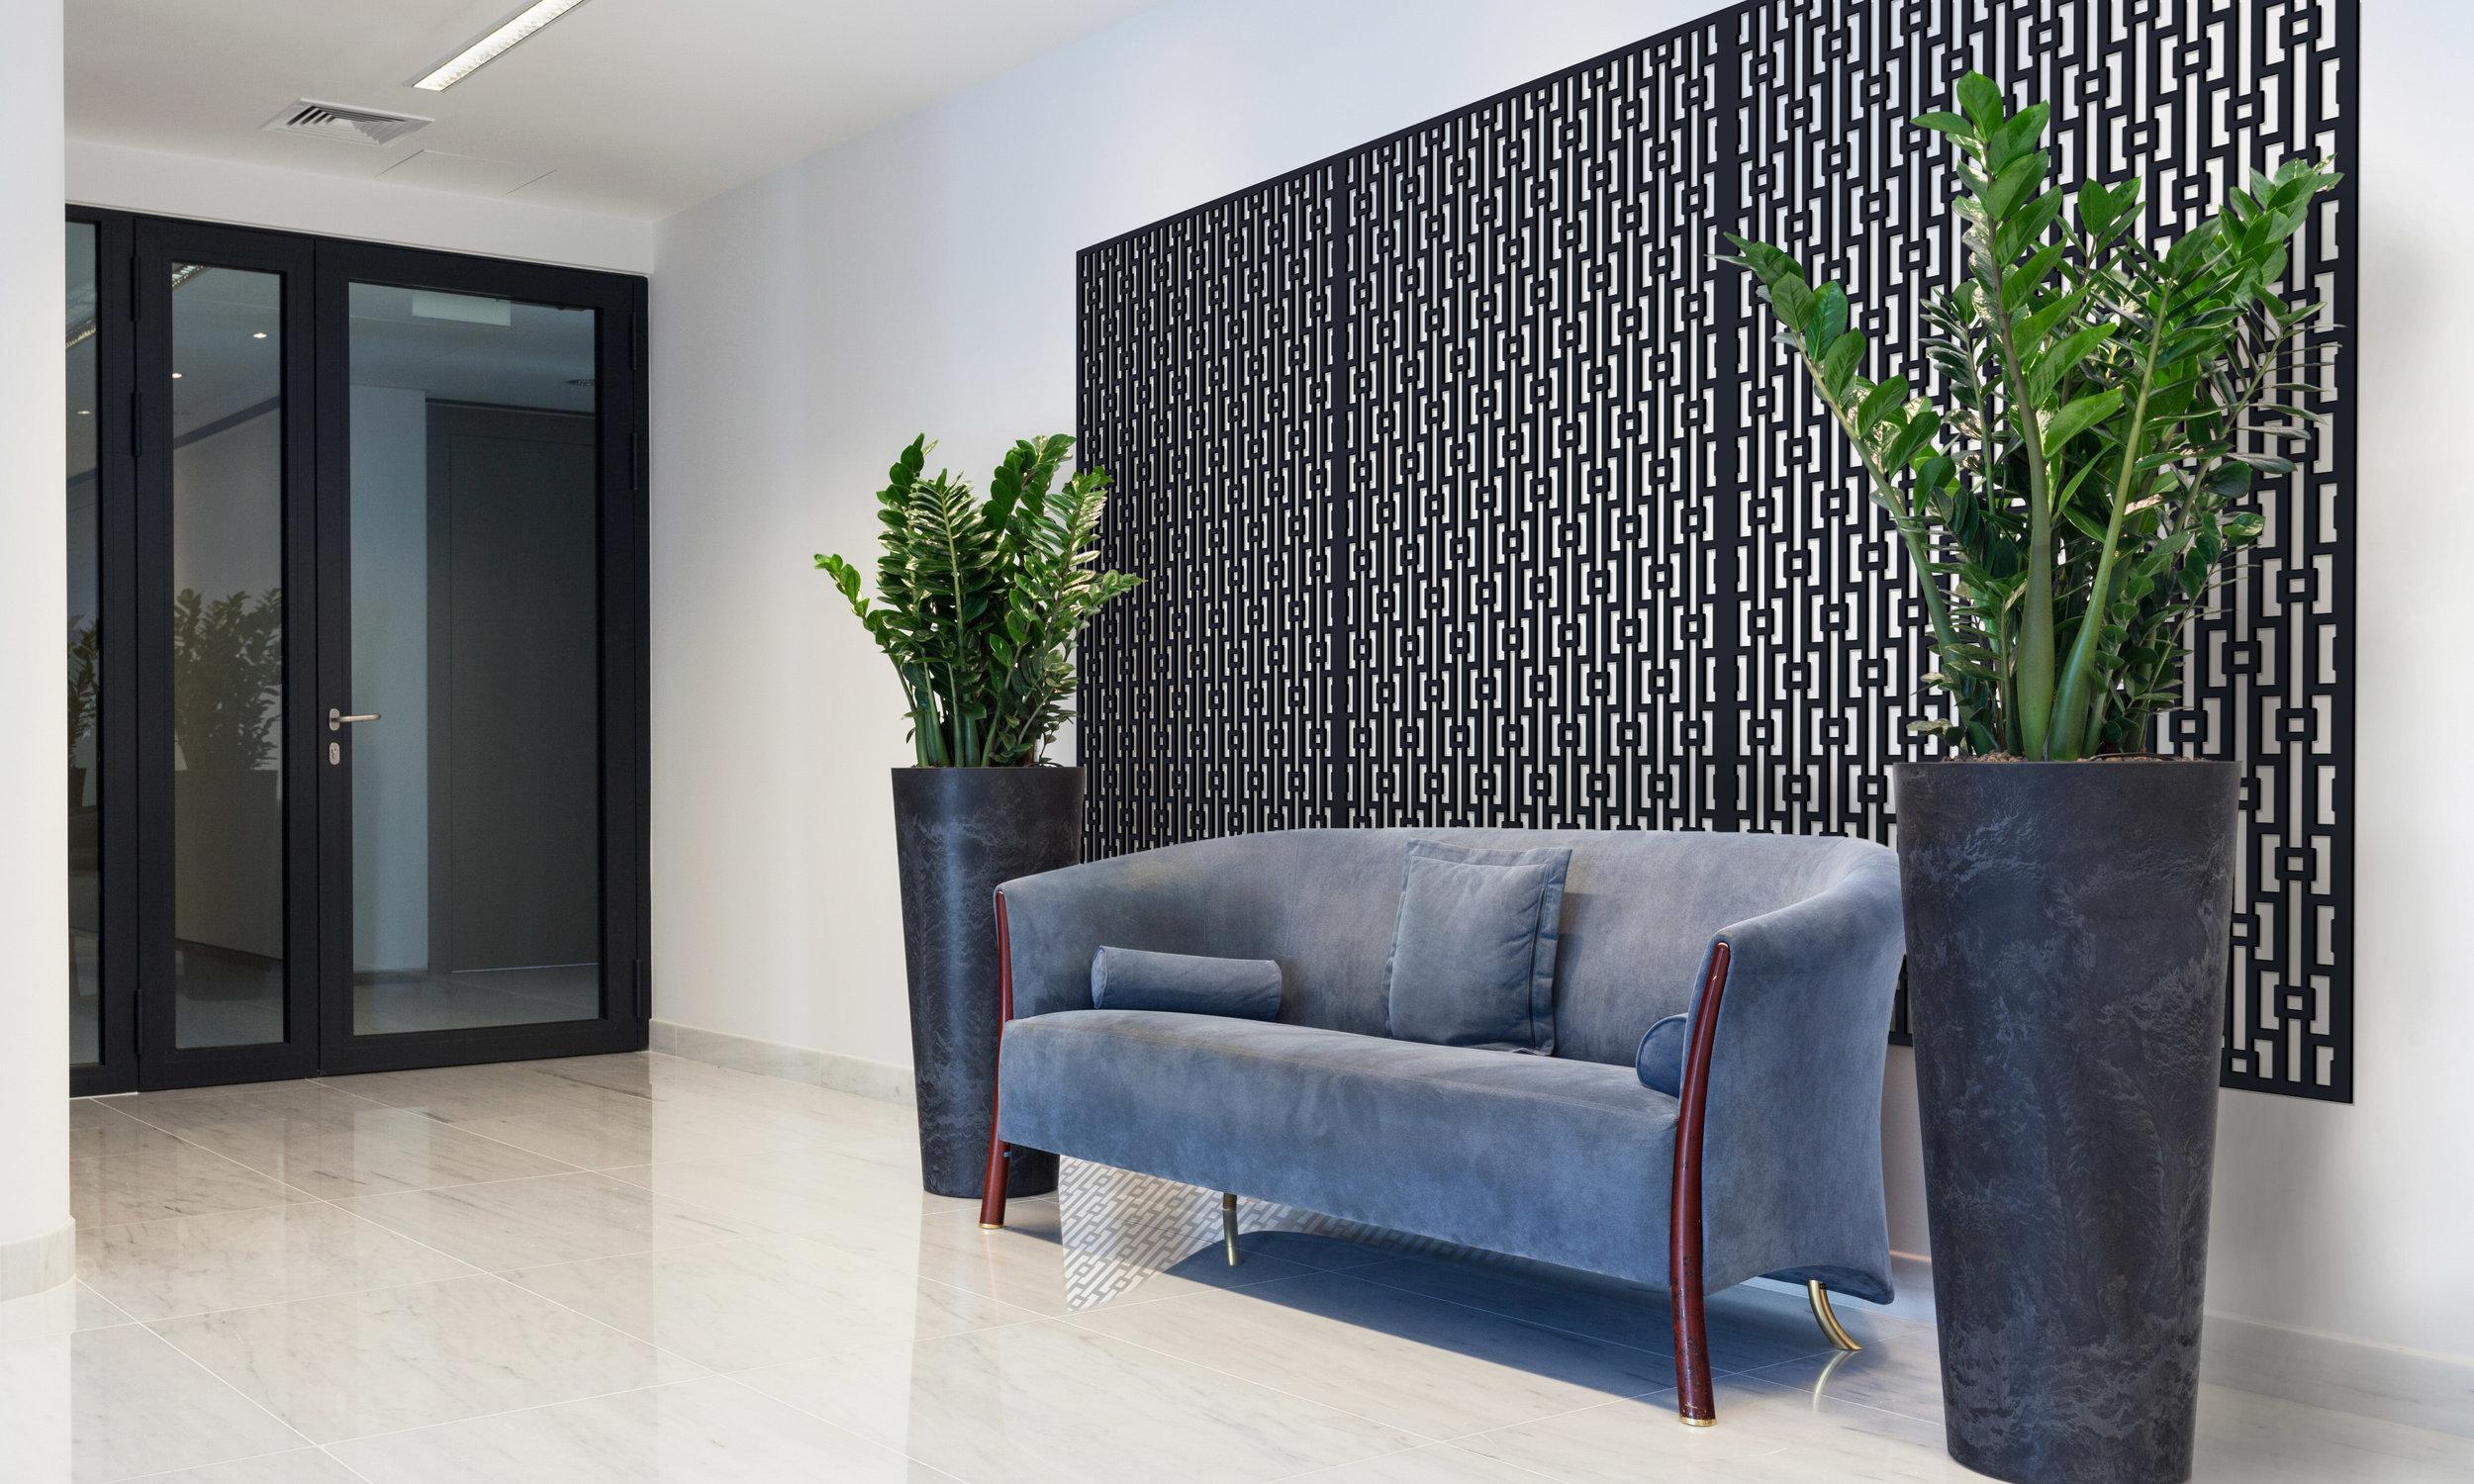 Installation Rendering B   Mod Geometric decorative office wall panel - painted